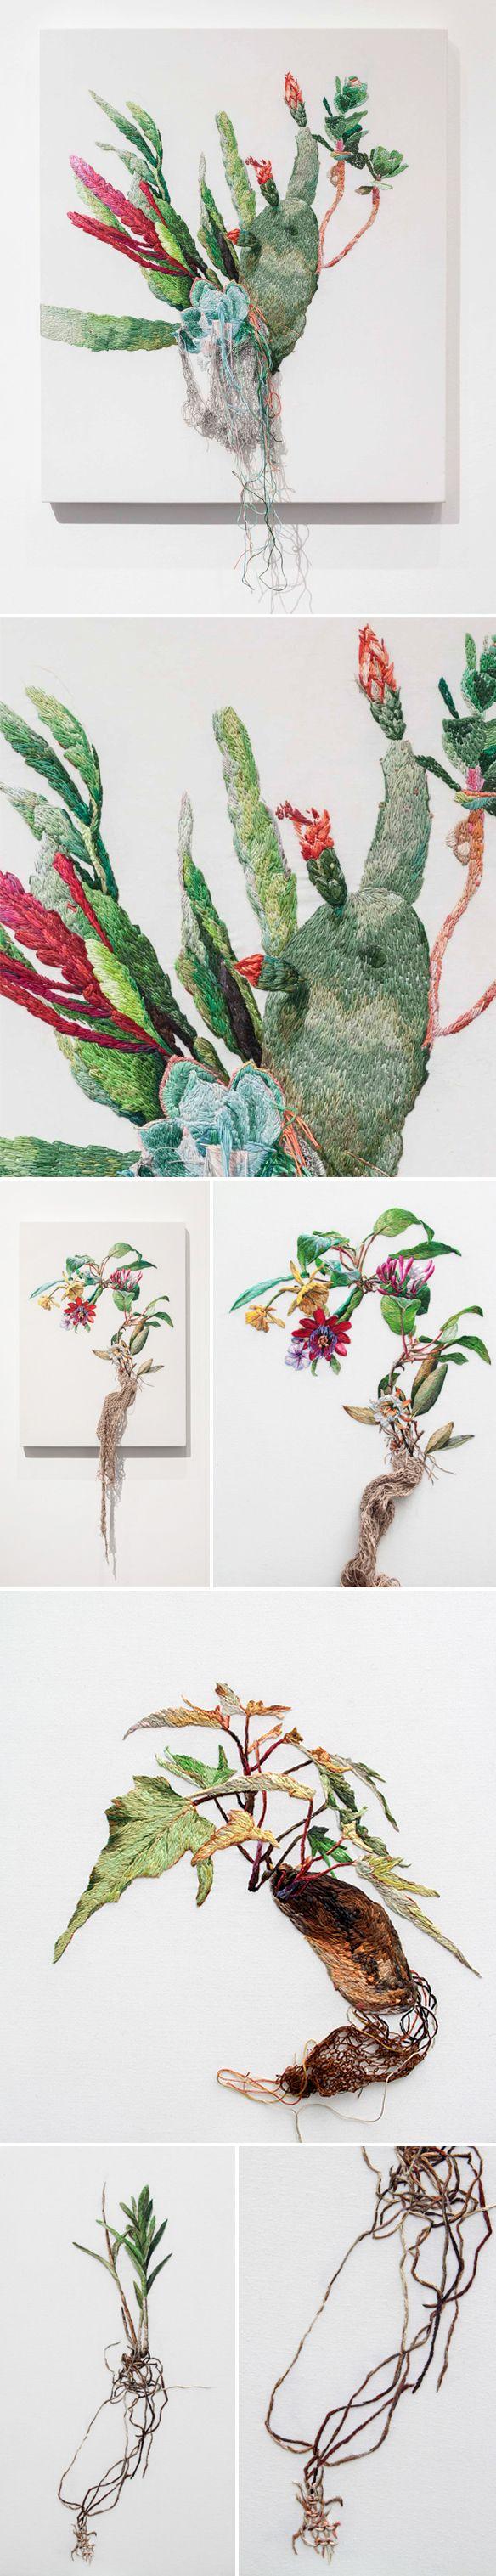 #centrotavola #centrotavolamilano #centrotavolafave embroidery by ana teresa barboza